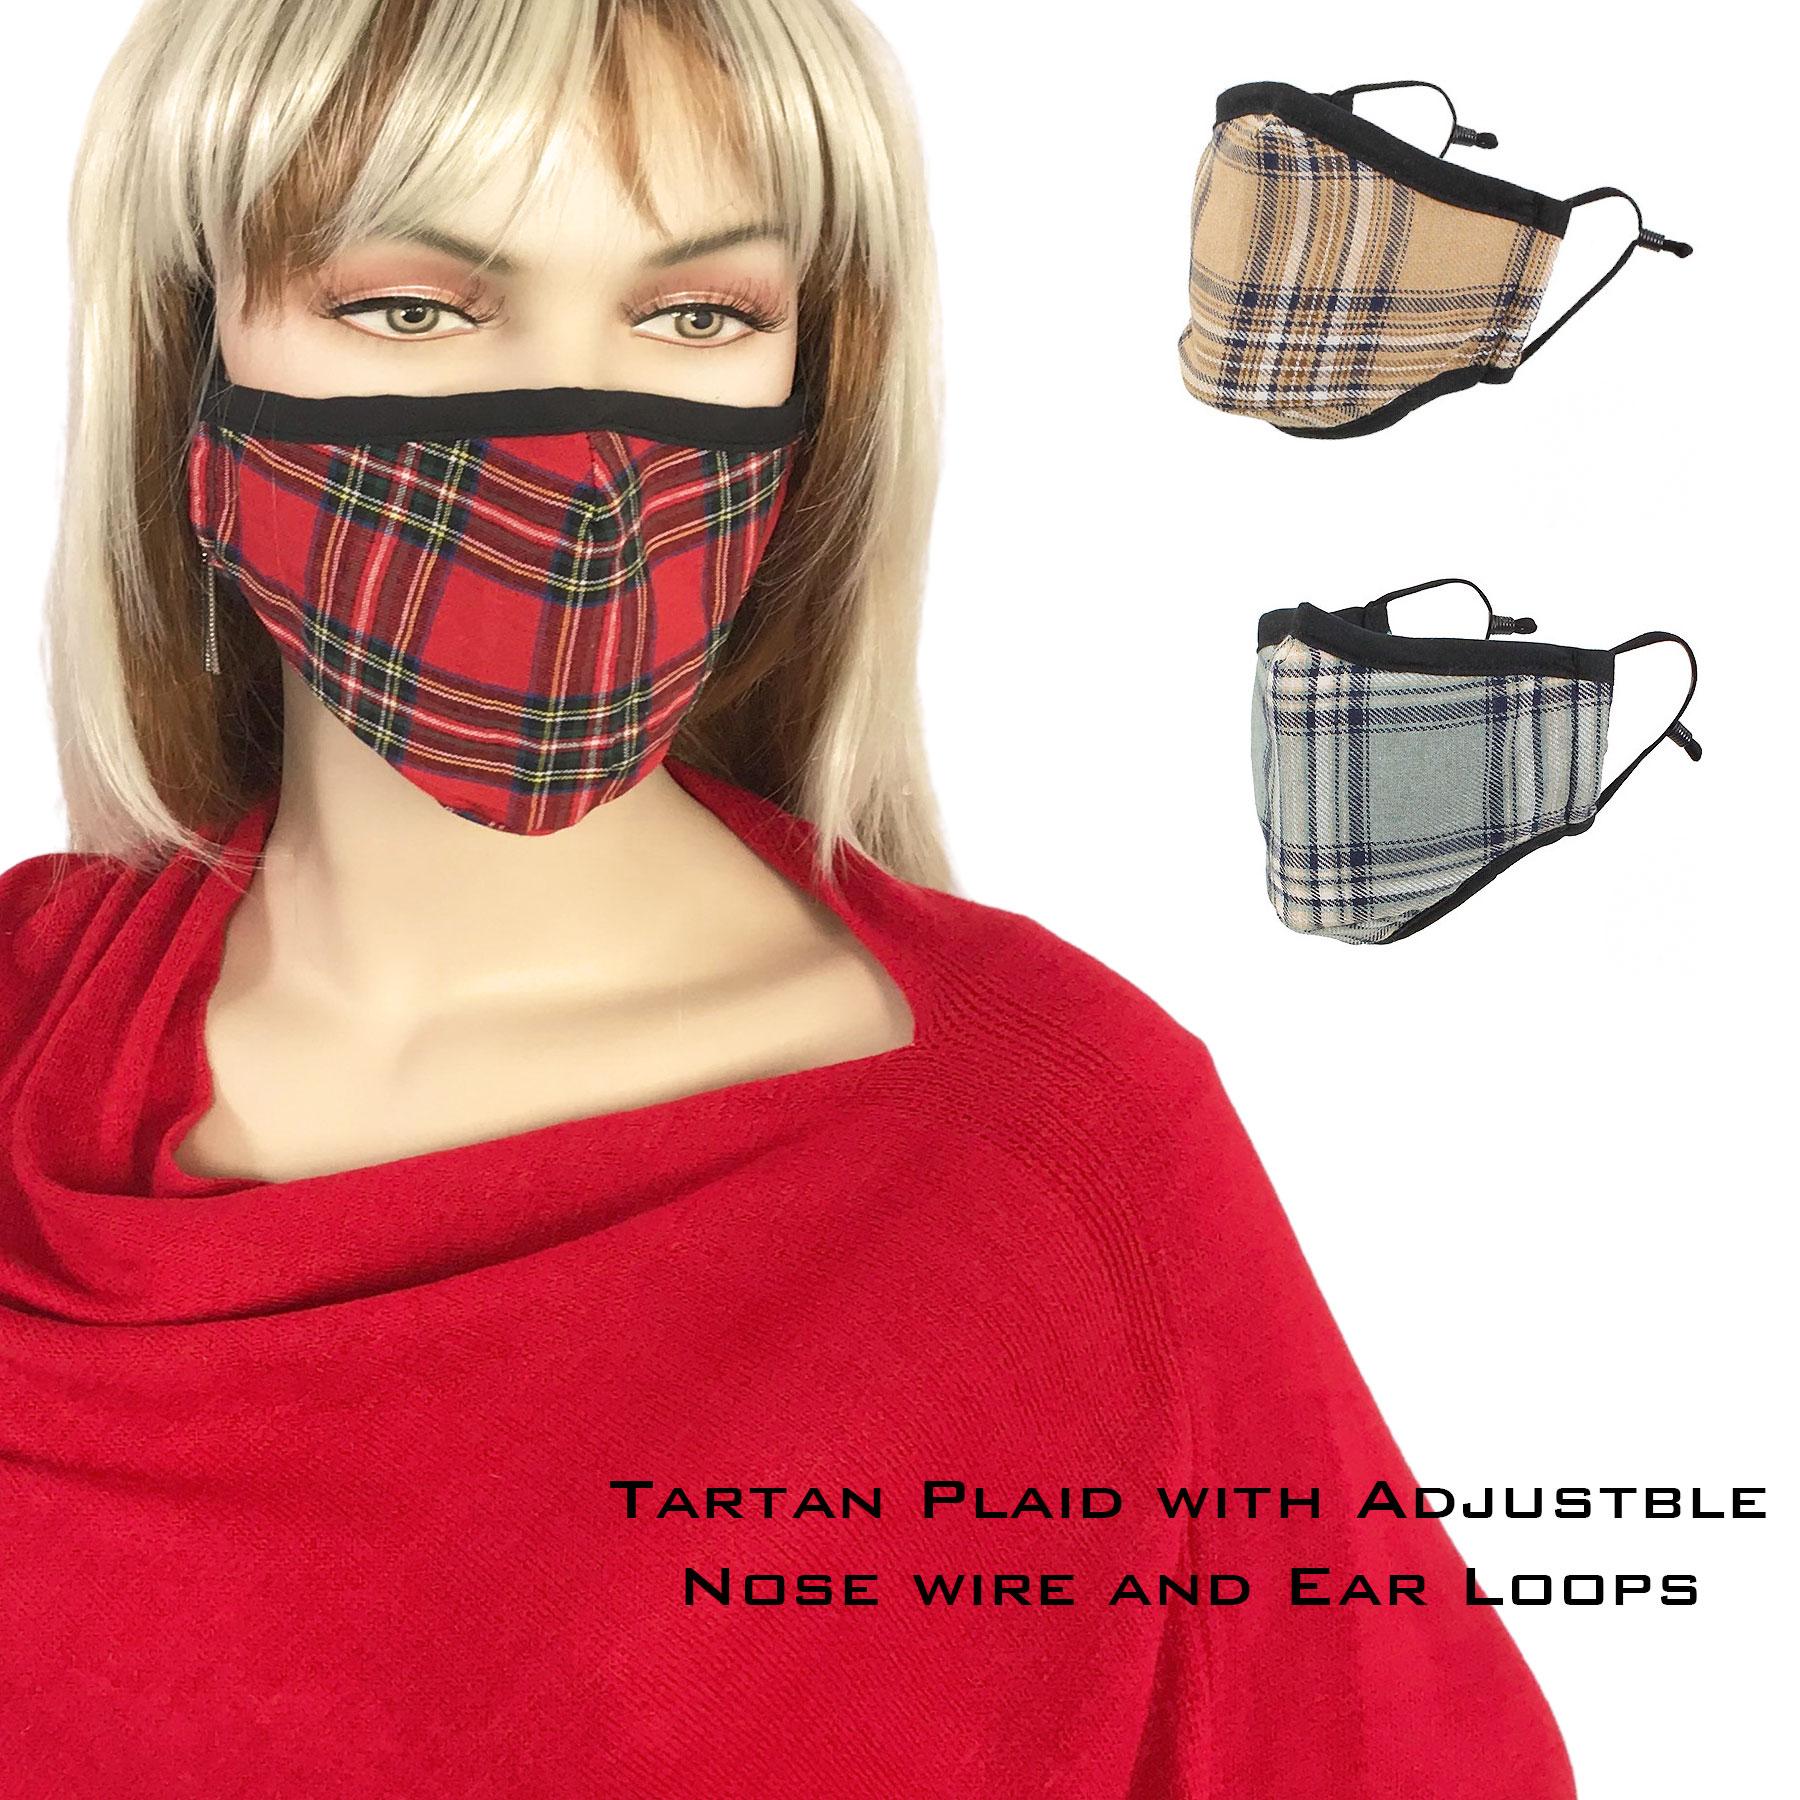 Protective Masks by Max - Tartan Plaids